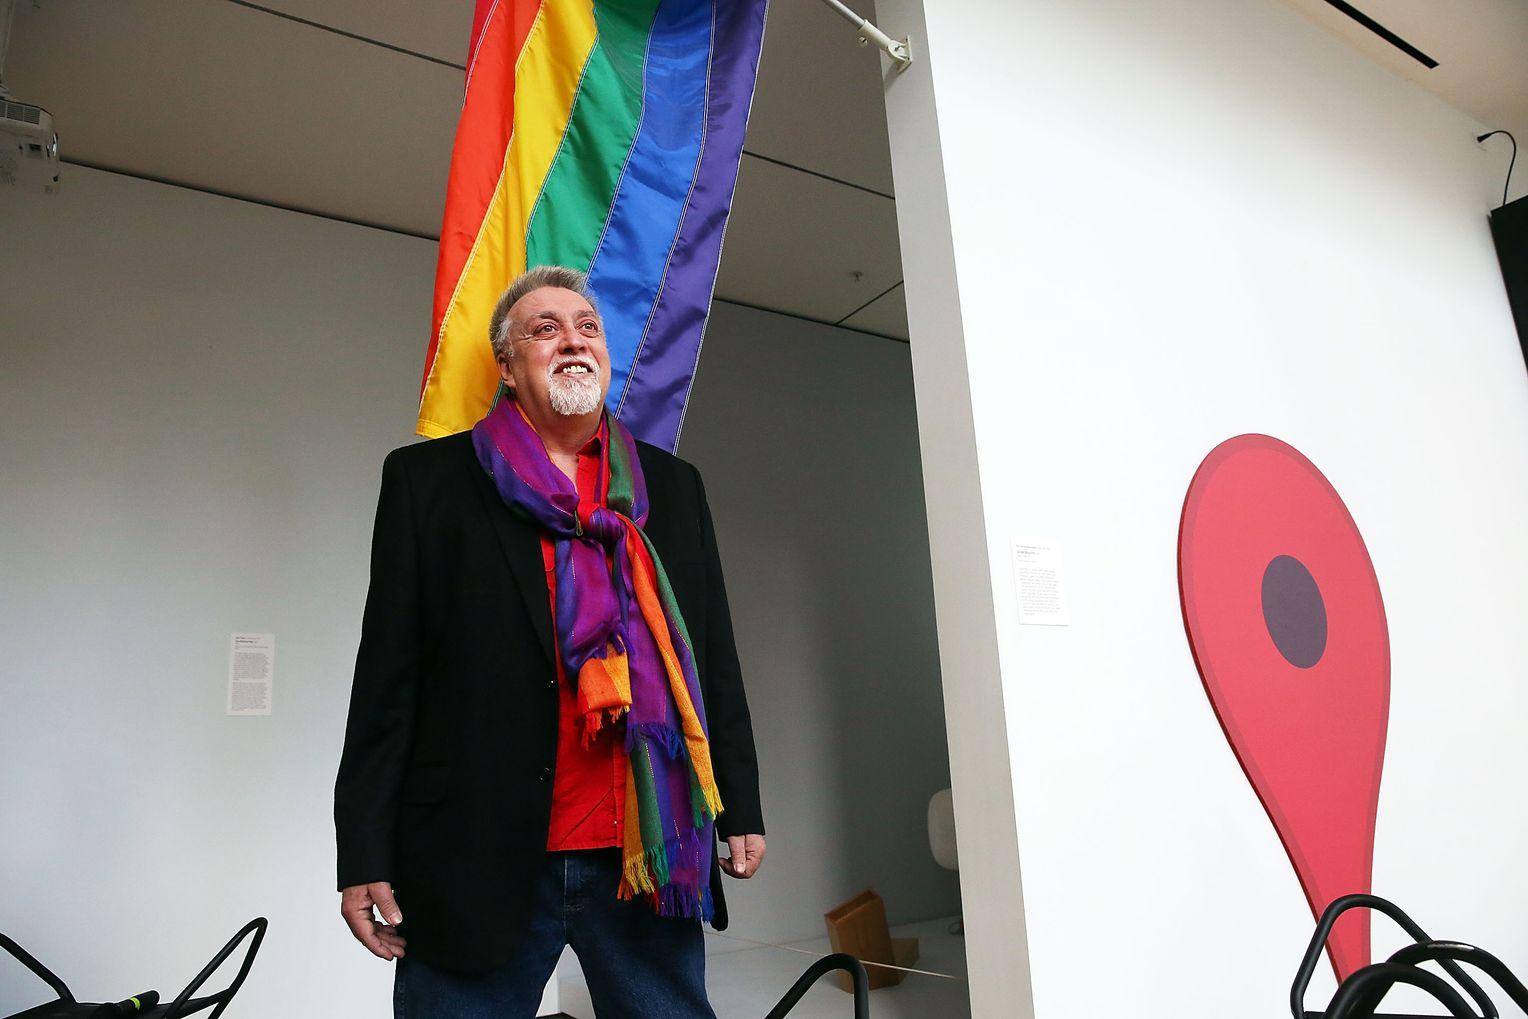 Gilbert Baker in front oh the Rainbow Flag in the Museum of Modern Art, New York, NY, USA.  Photo by Spencer Platt.